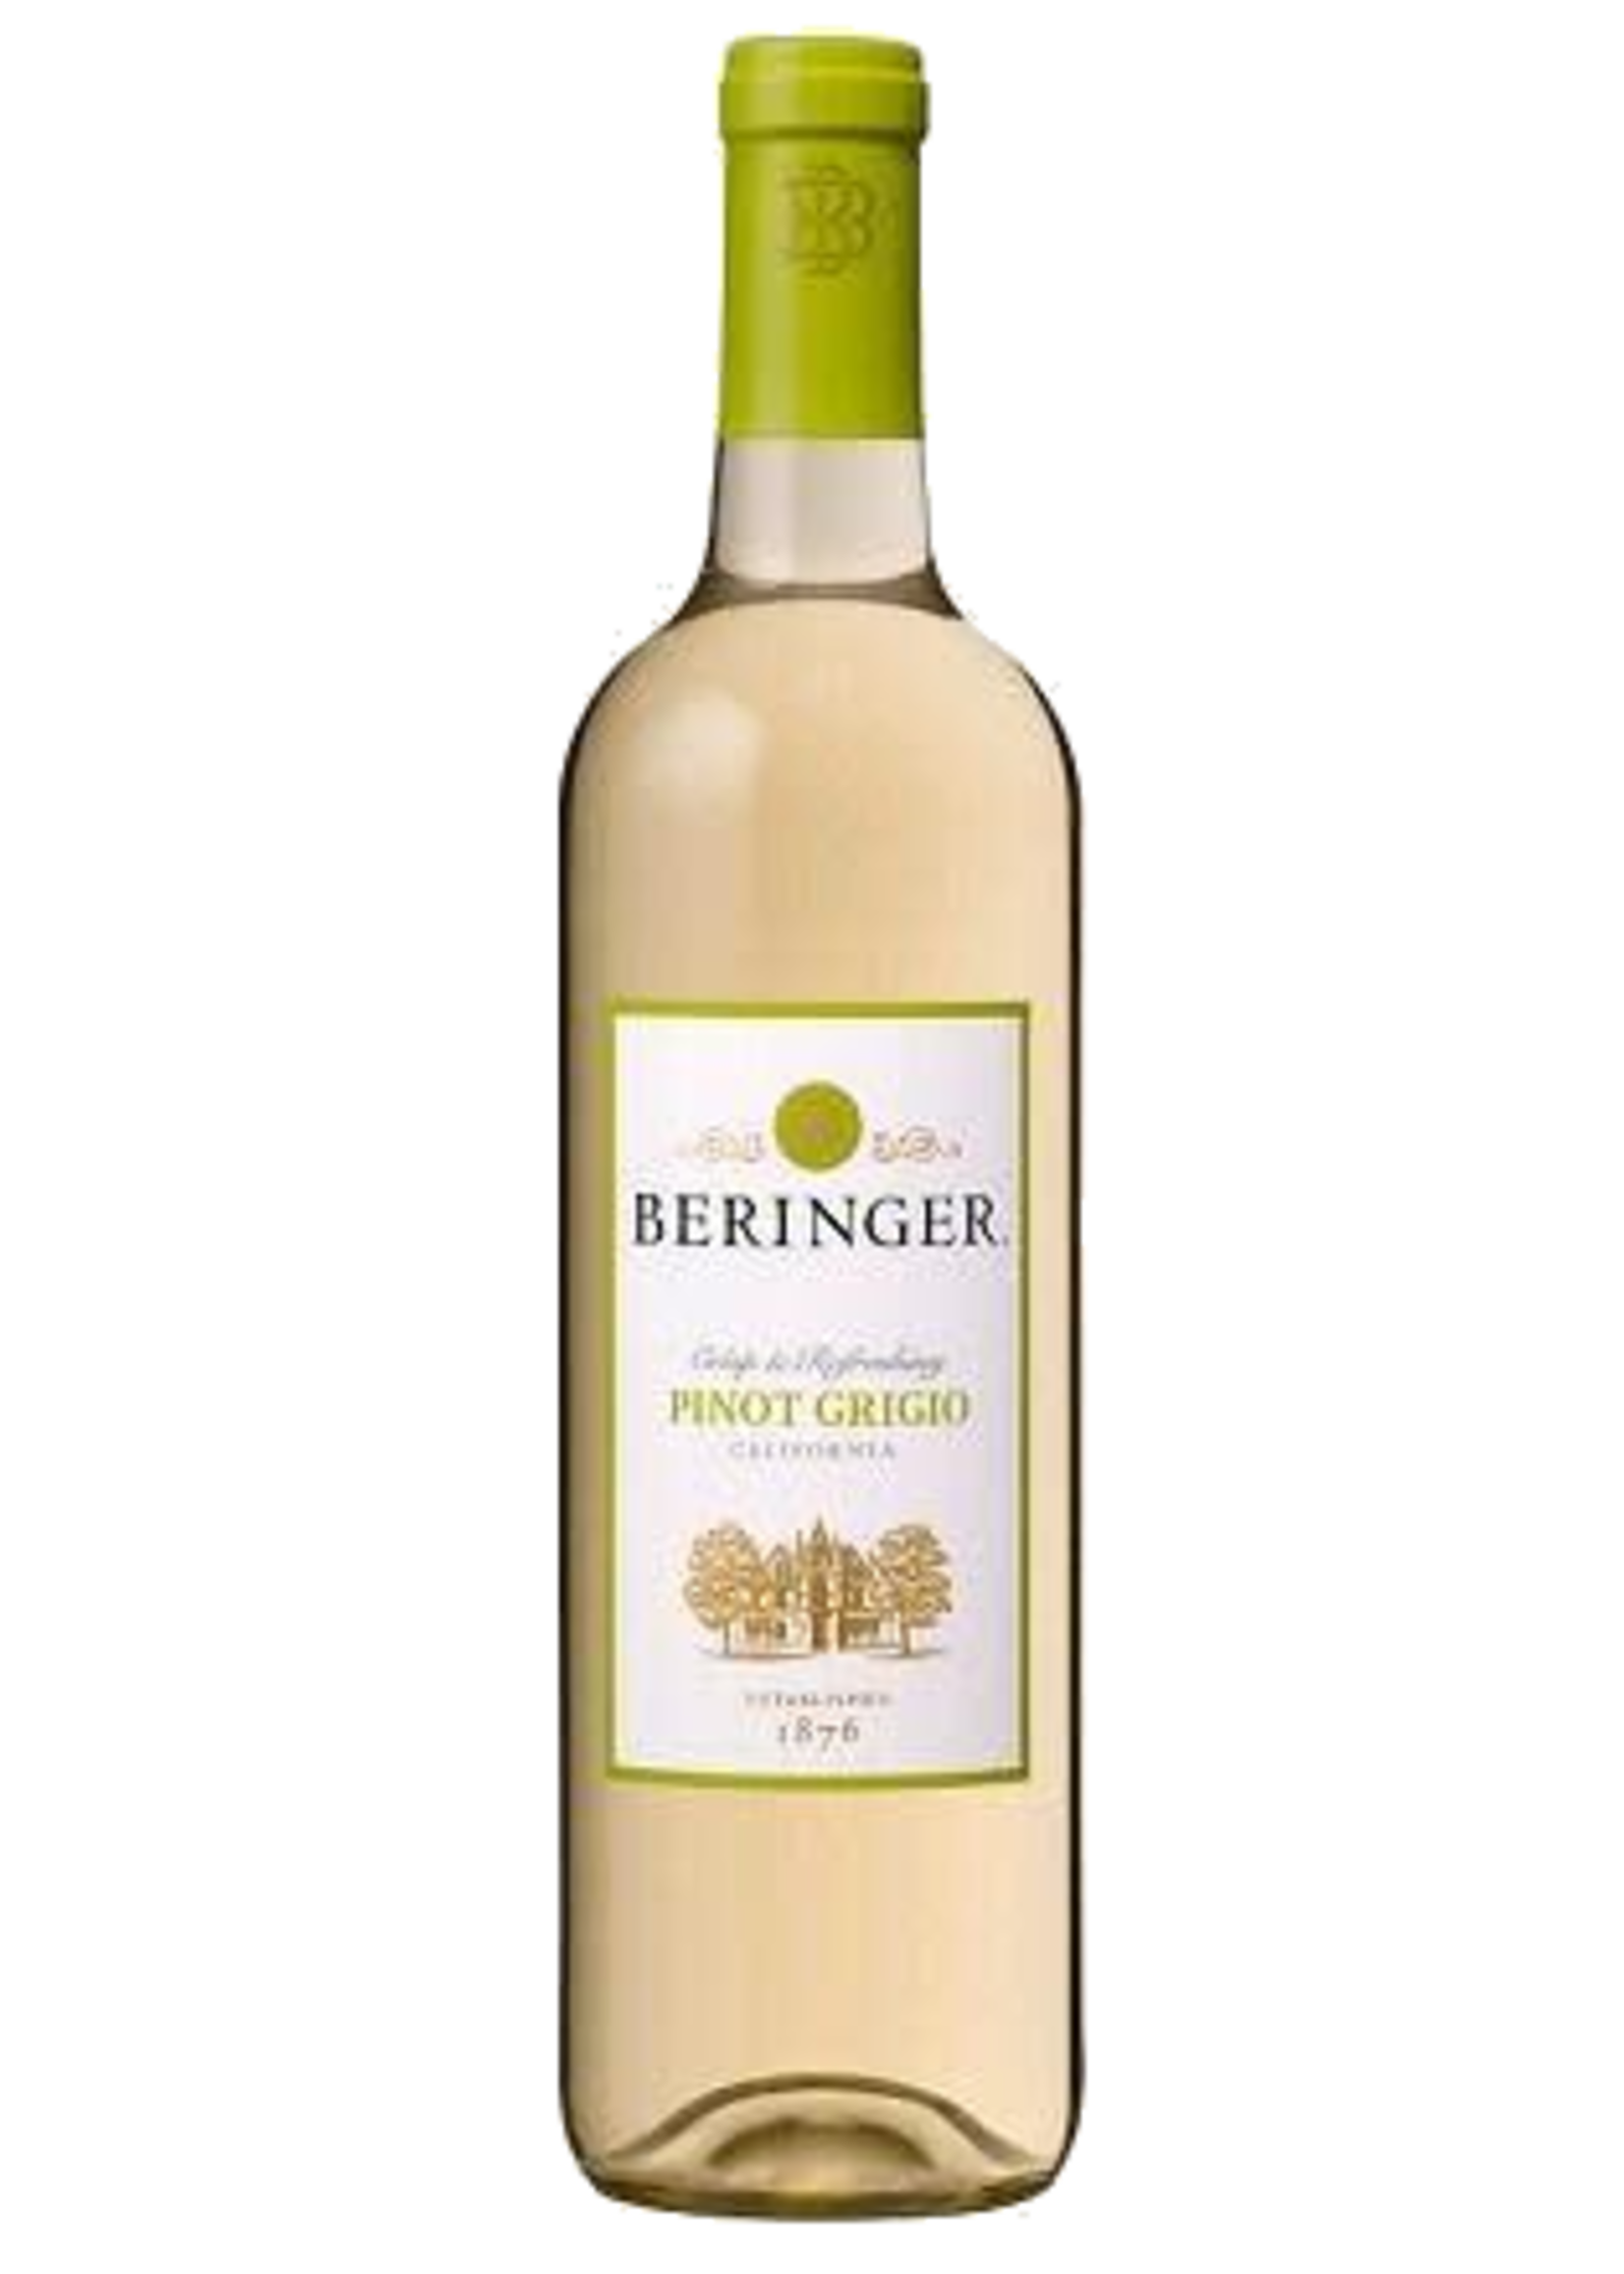 Beringer Beringer / Pinot Grigio / 750mL